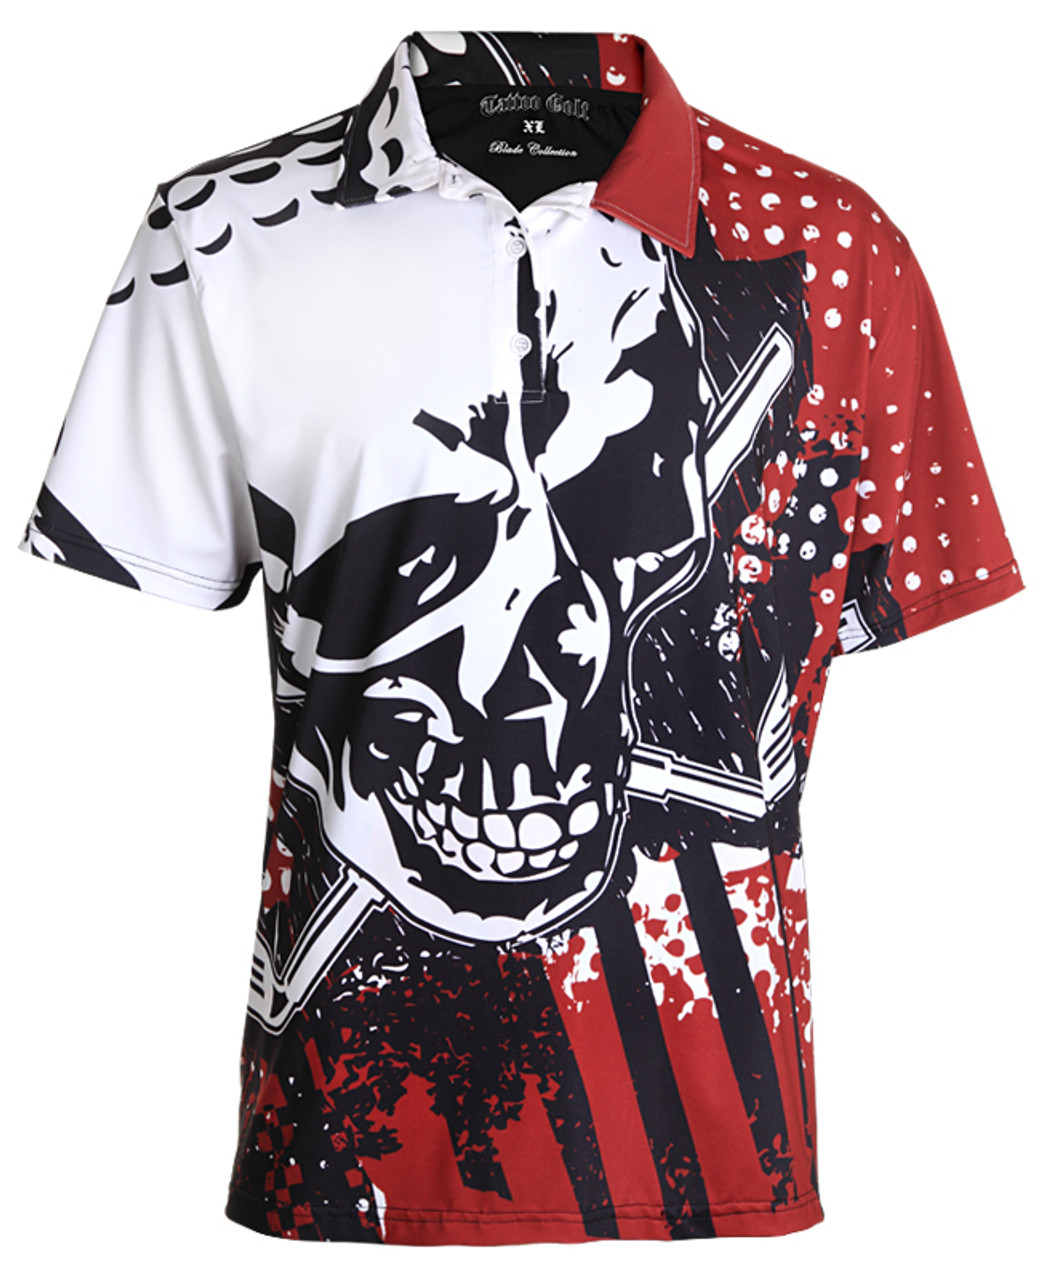 Golf Polo Shirts - The Blade Golf Shirt